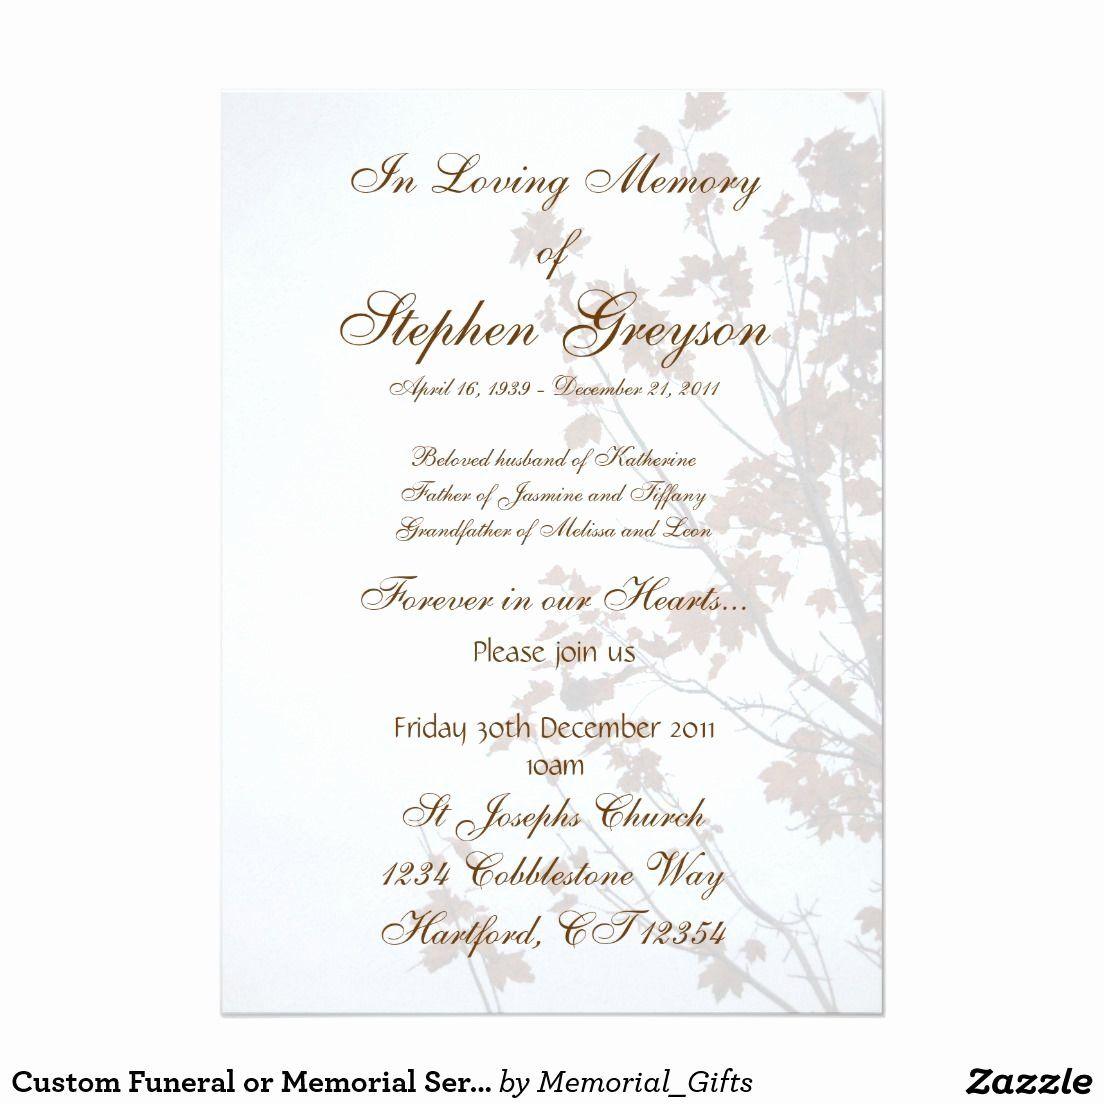 Memorial Service Invitation Template Free Luxury Custom Funeral Or Memorial Service Announce Funeral Invitation Memorial Service Invitation Invitation Template